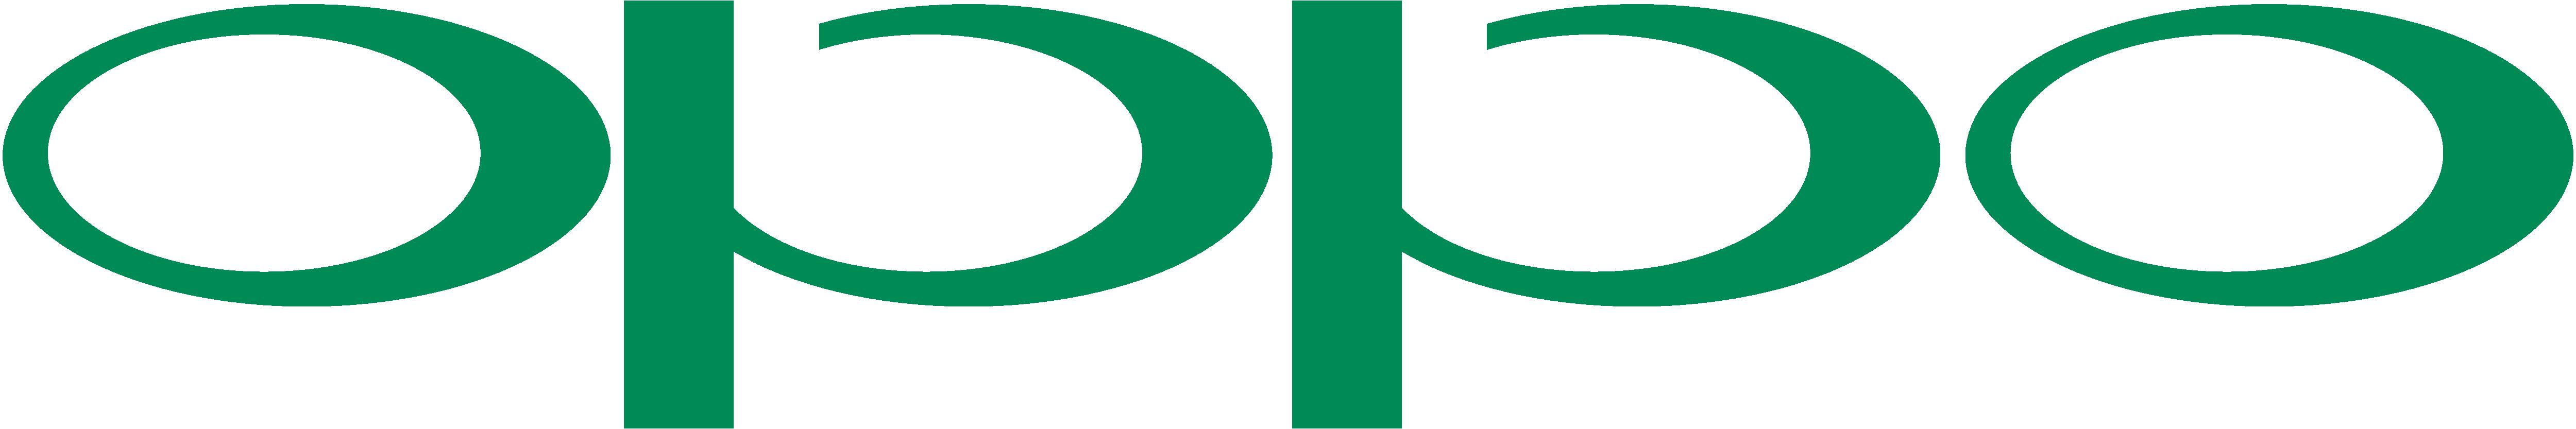 Oppo – Logos Download - Oppo Logo PNG